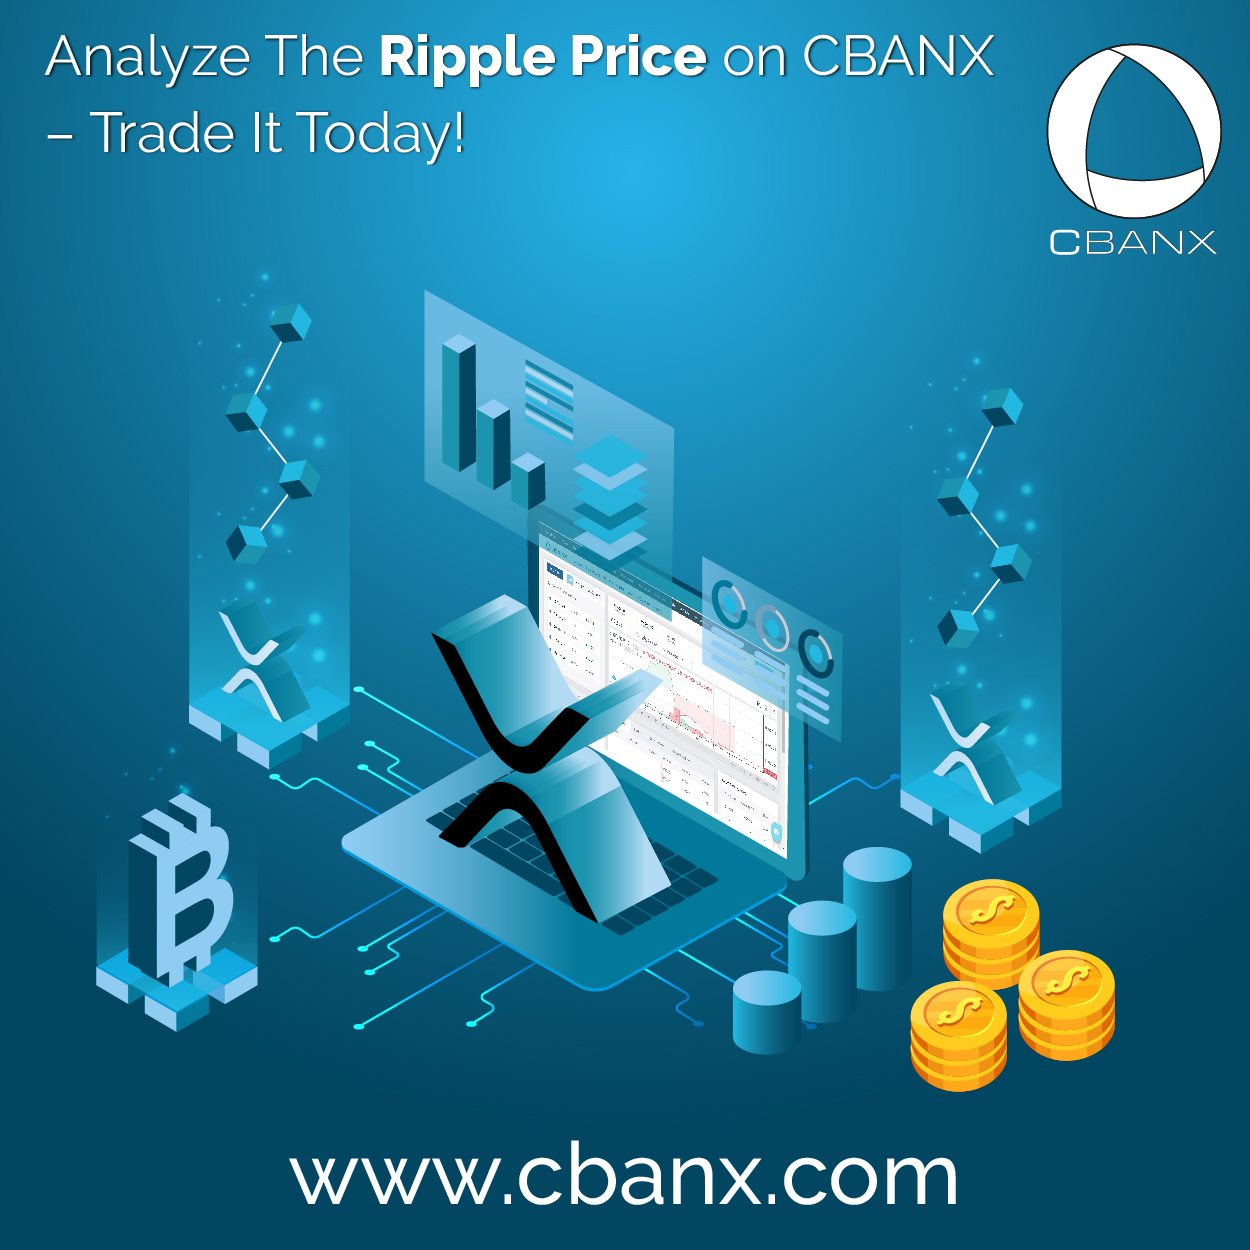 Analyze The Ripple Price on CBANX – Trade It Today!